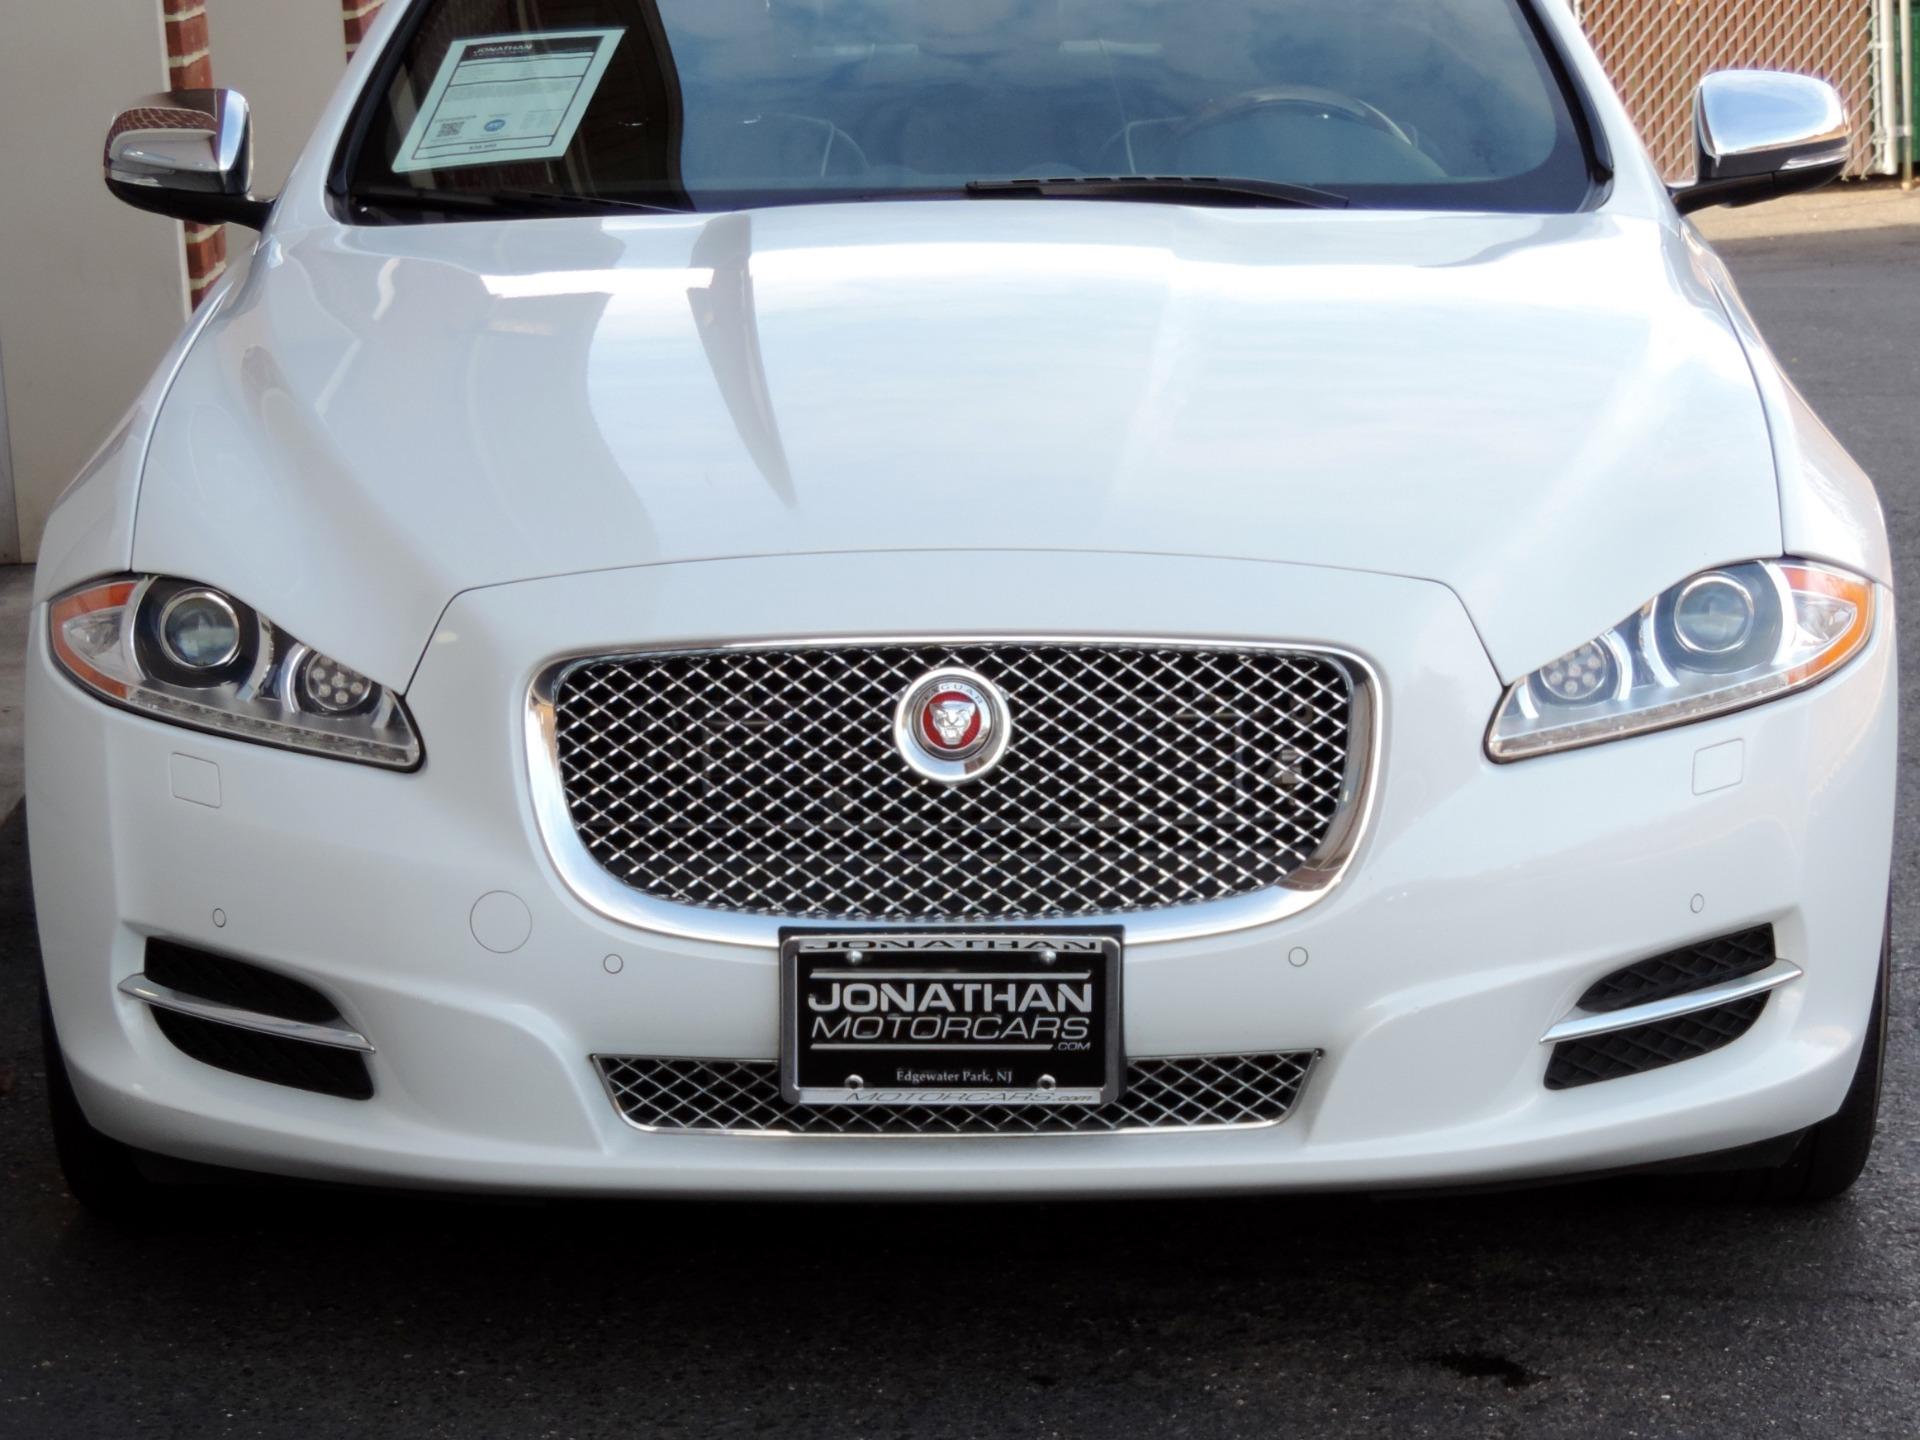 review automotivetimes exterior xj jaguar xjl com